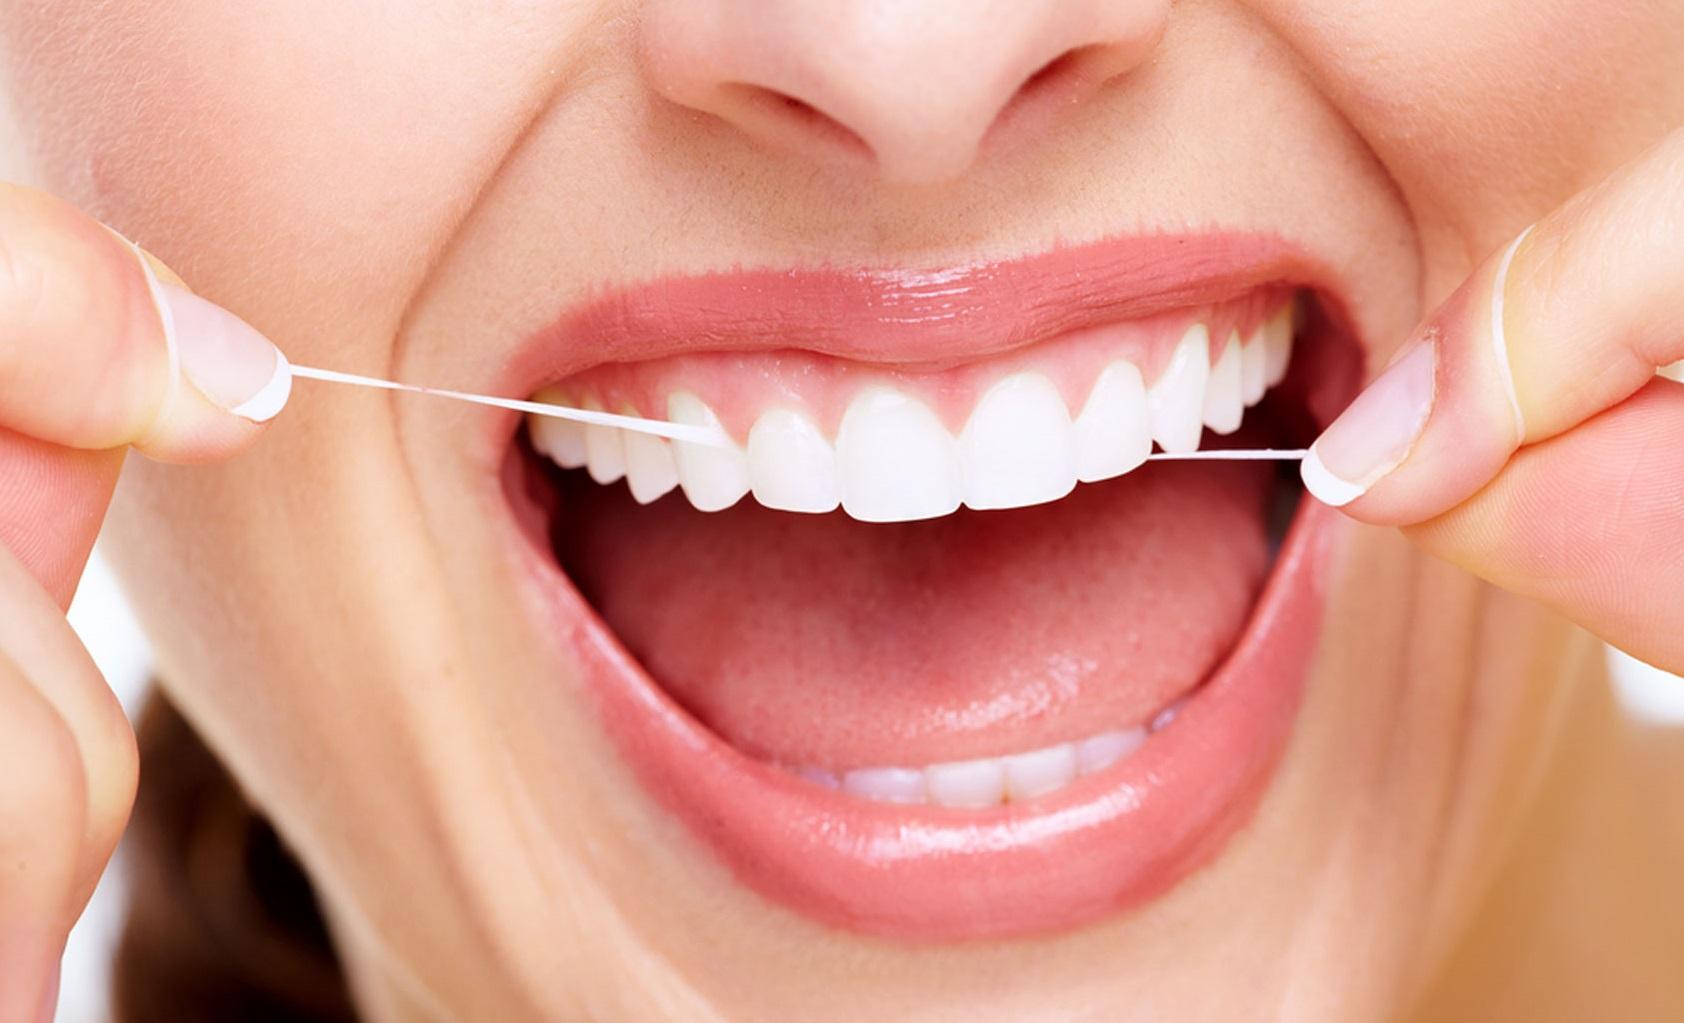 dentifrice - fil dentaire - hygiène bucco-dentaire